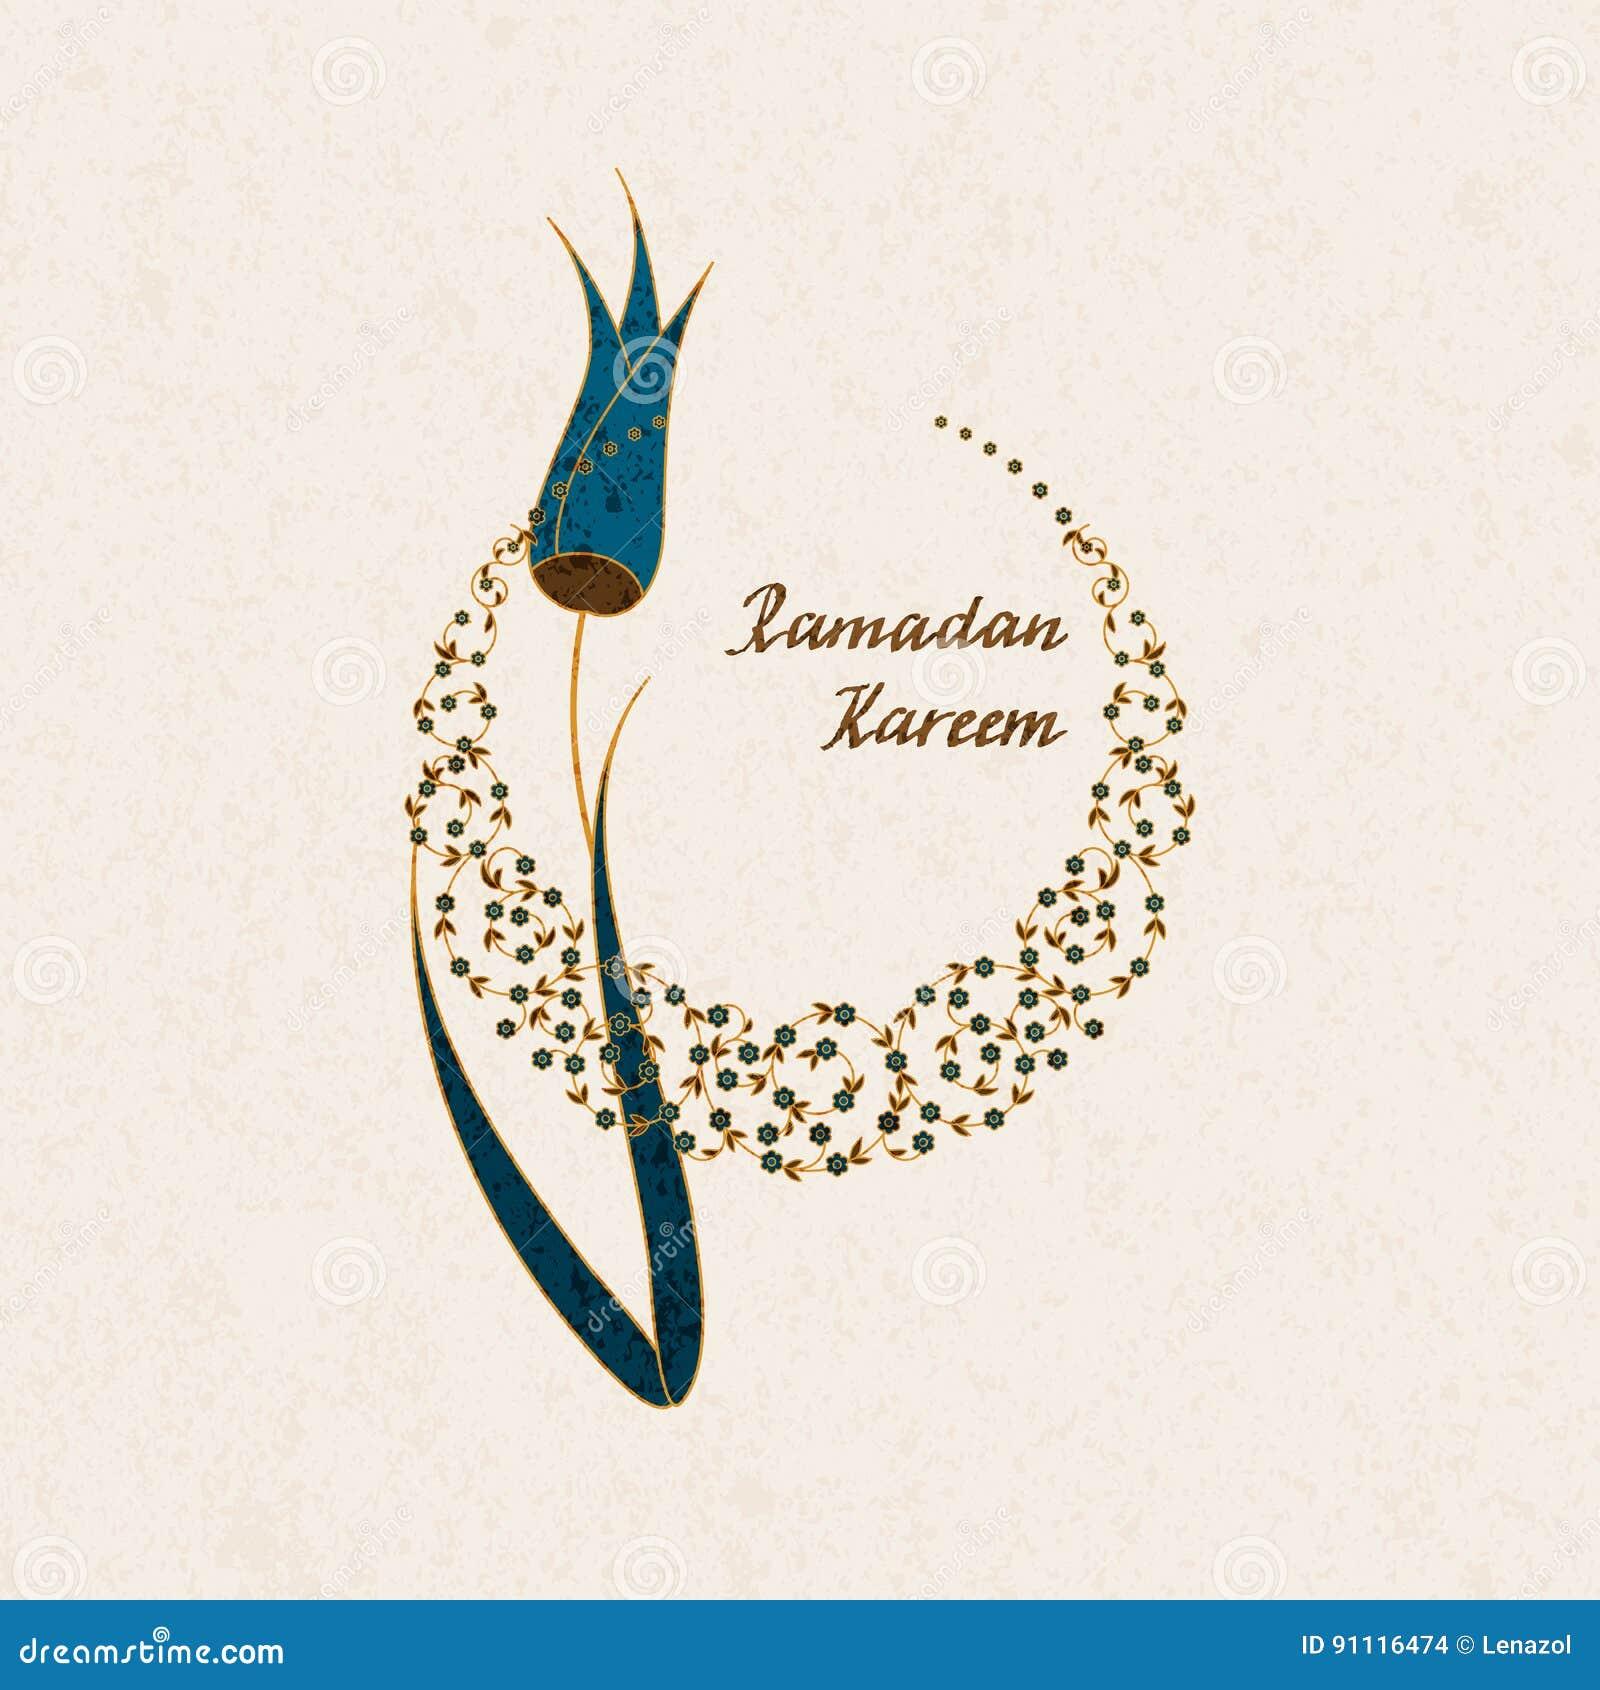 Vector Arabic Postcard With Hand Drawn Words Ramadan Kareem A Flower